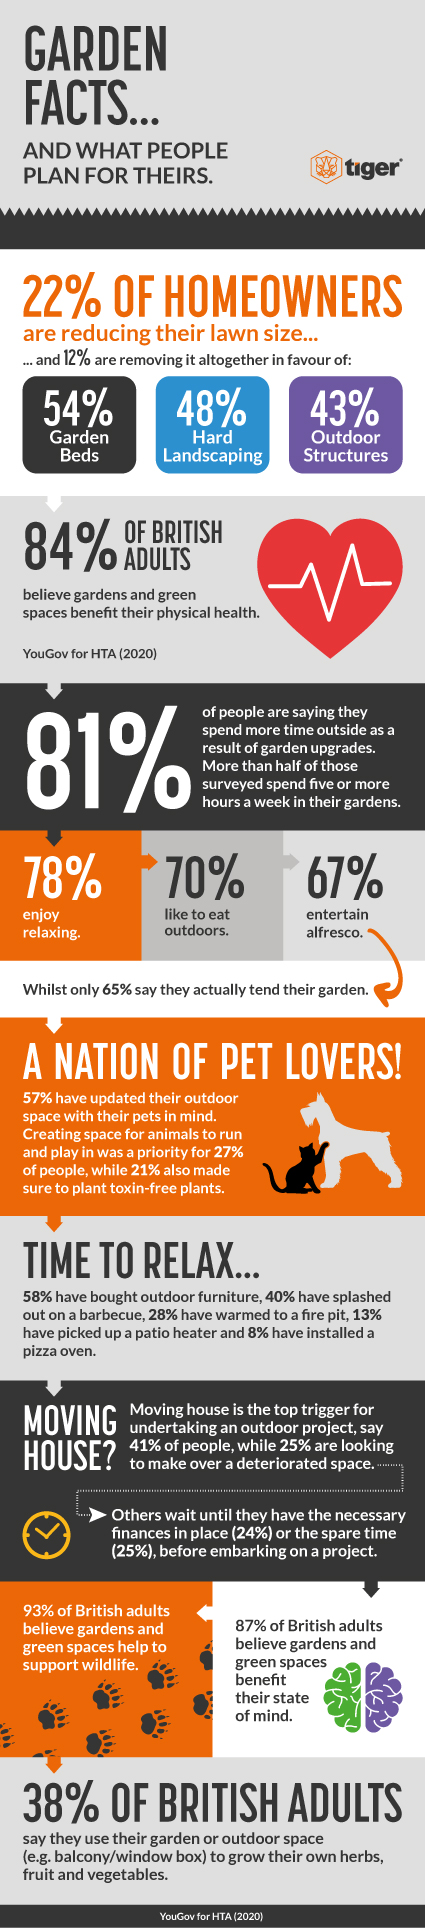 Garden Facts